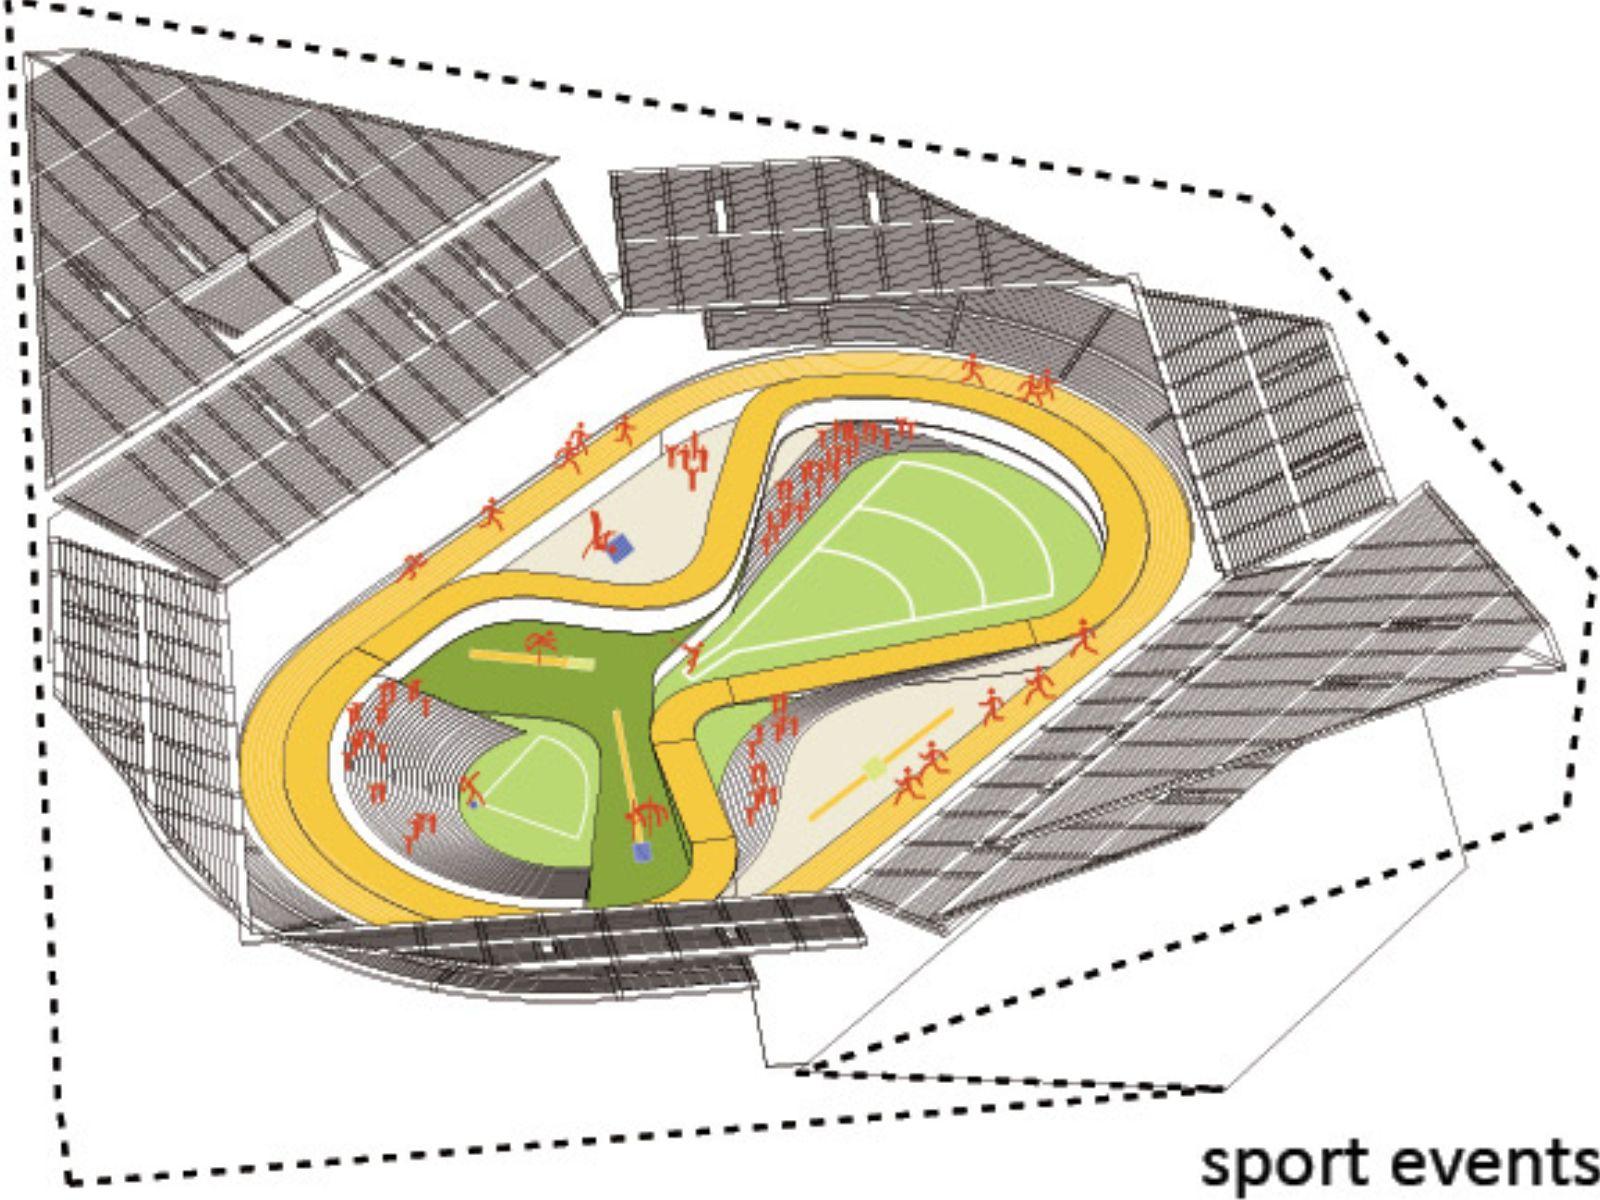 09-Brasilia-atletismo-Estadio-por-BF-arquitectura